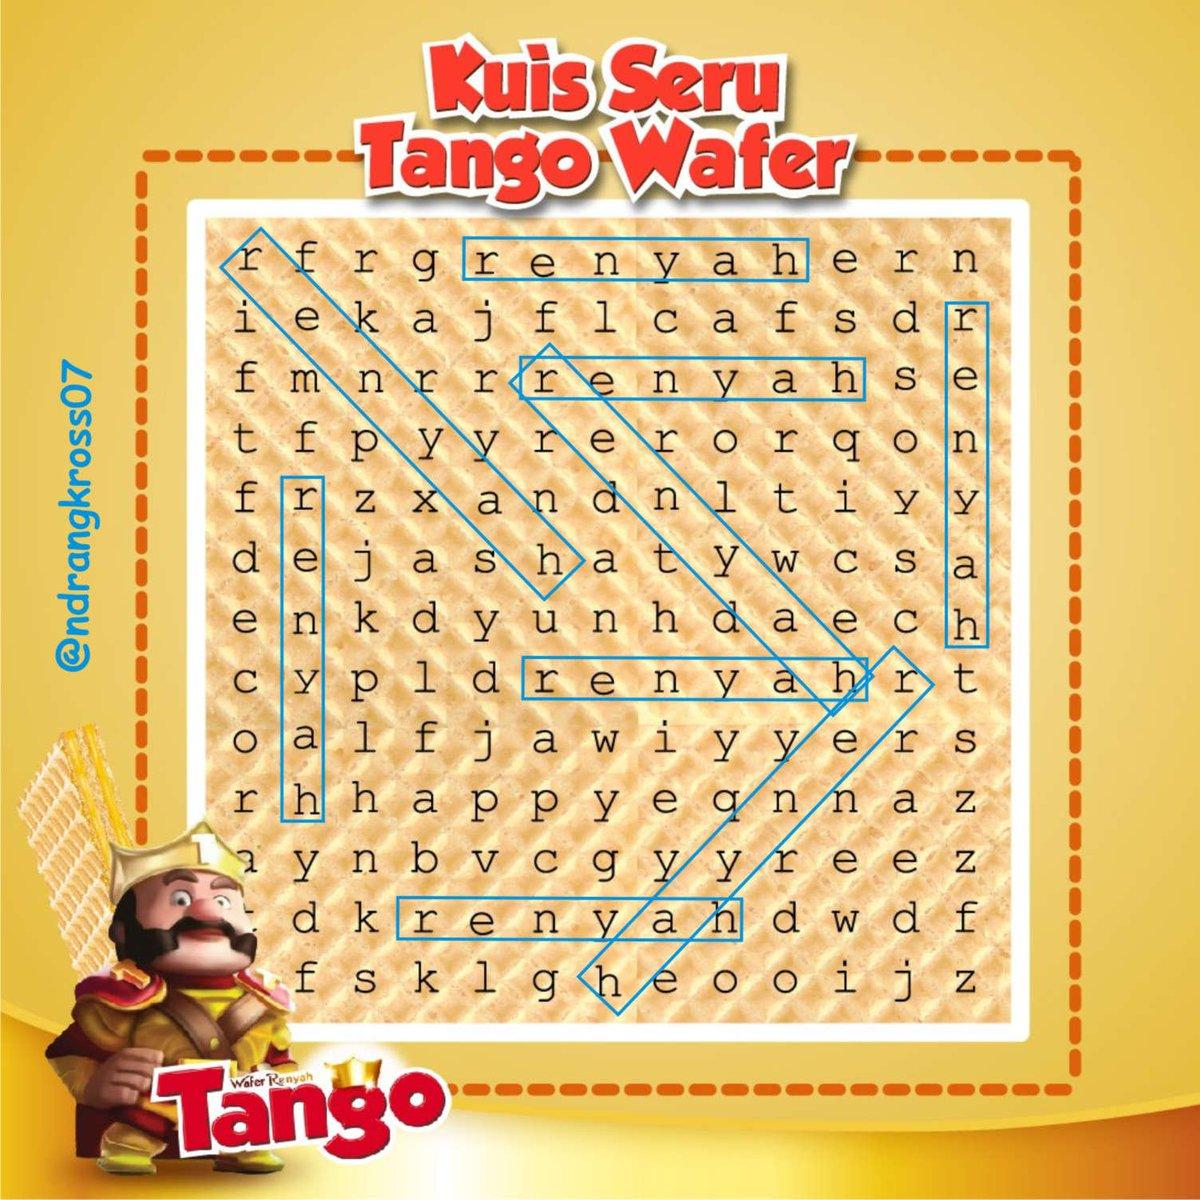 Wafer Tango Renyah On Twitter Kuisserutangowafer Ada Berapa Tanggo 0 Replies Retweets 1 Like